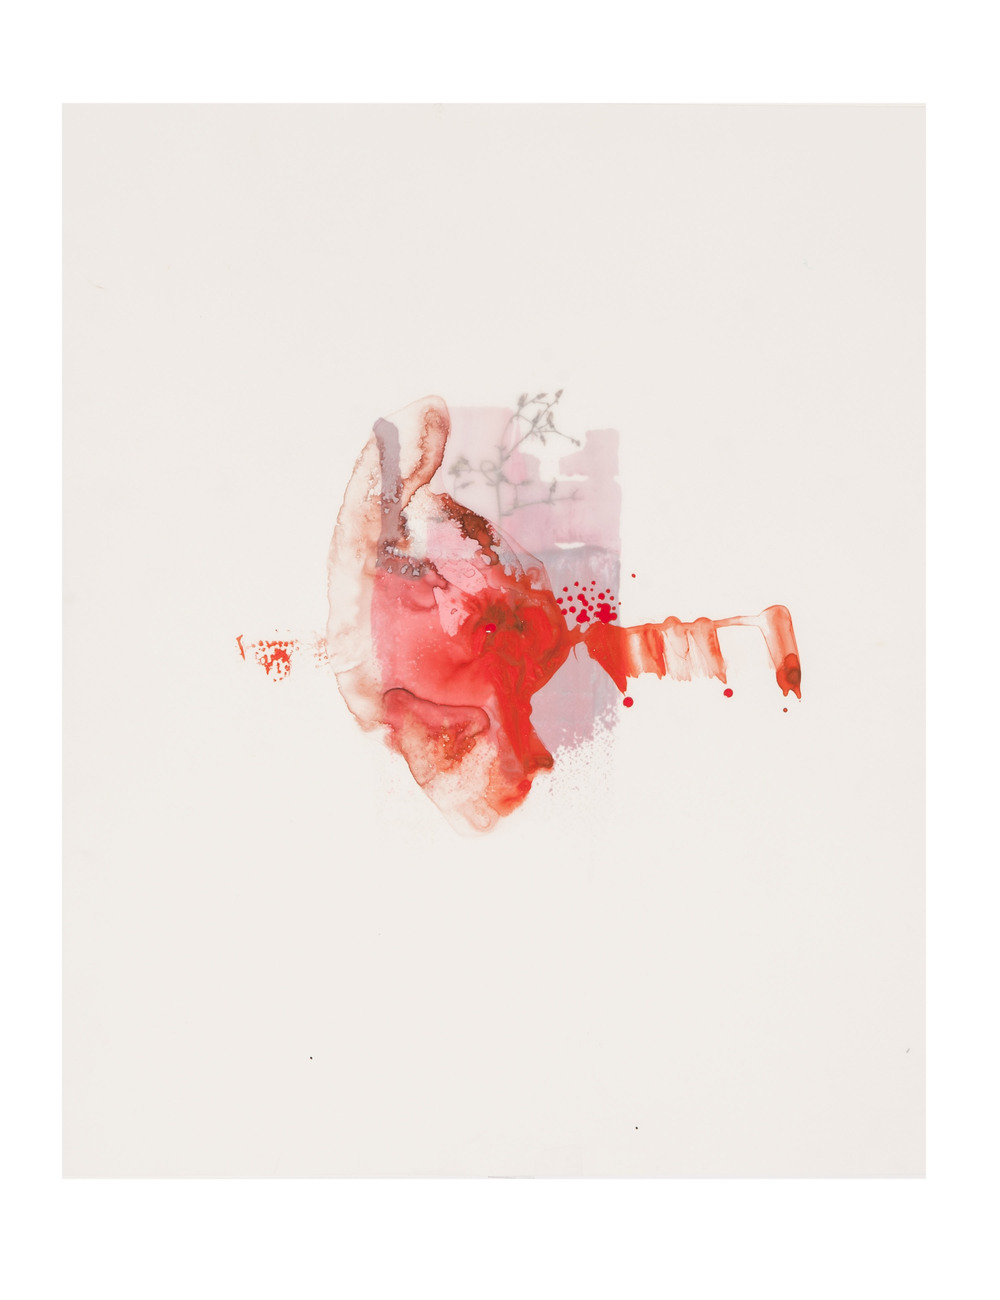 Untitled 023